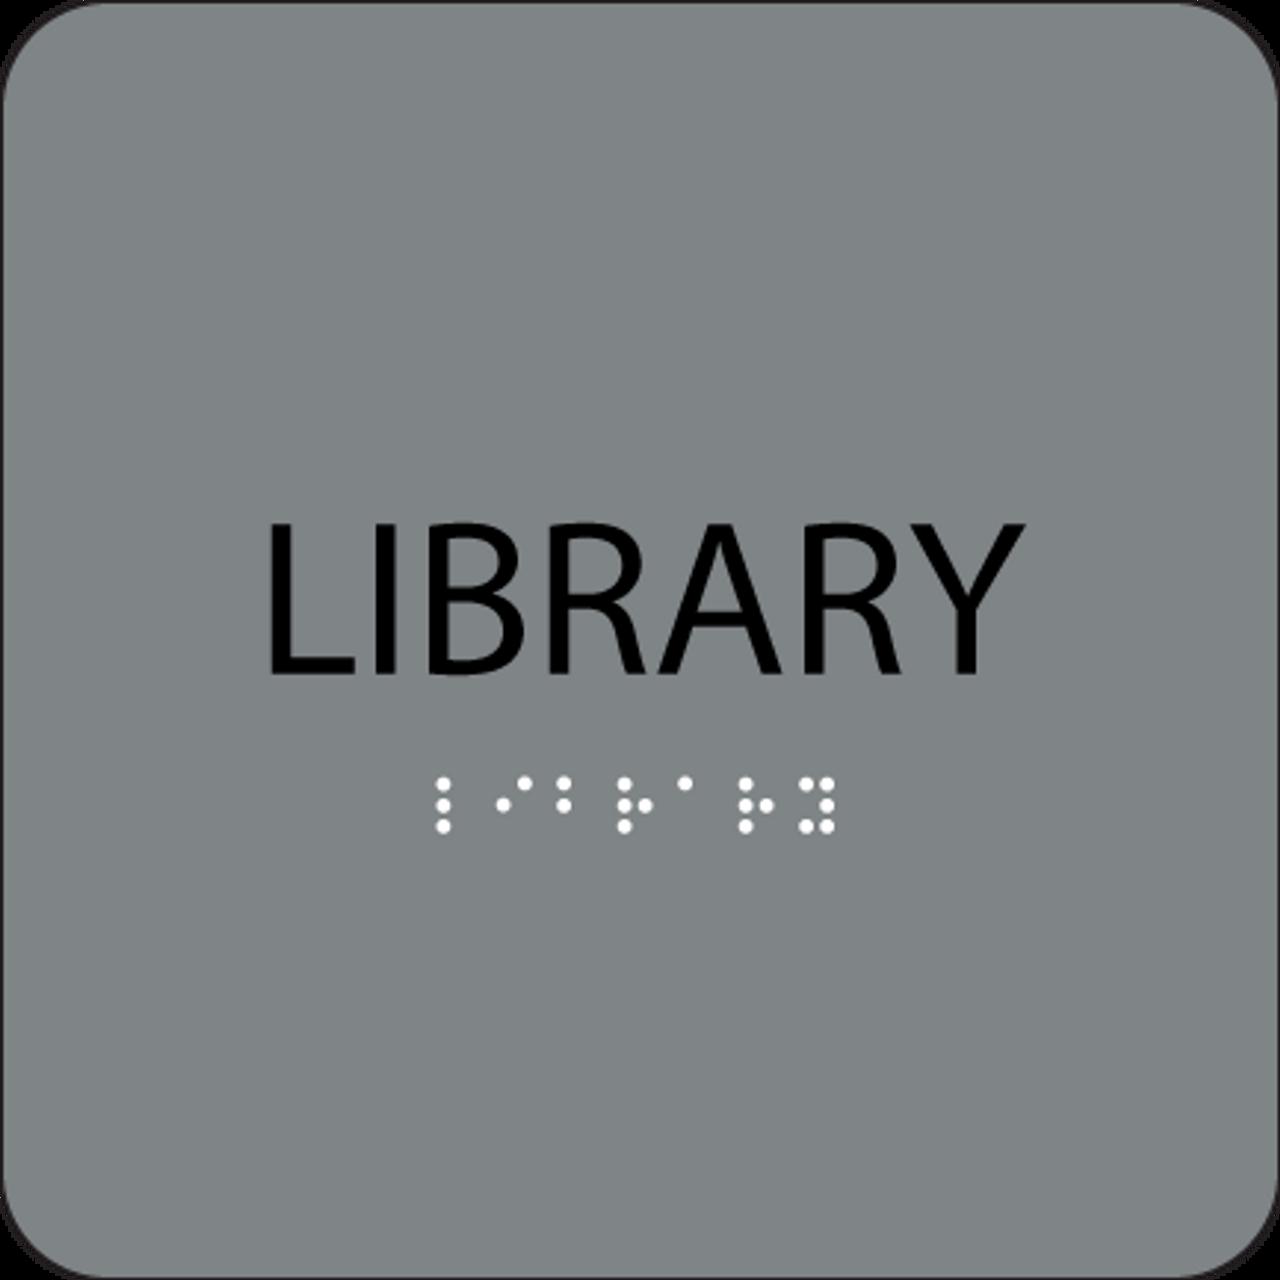 Grey Library ADA Sign